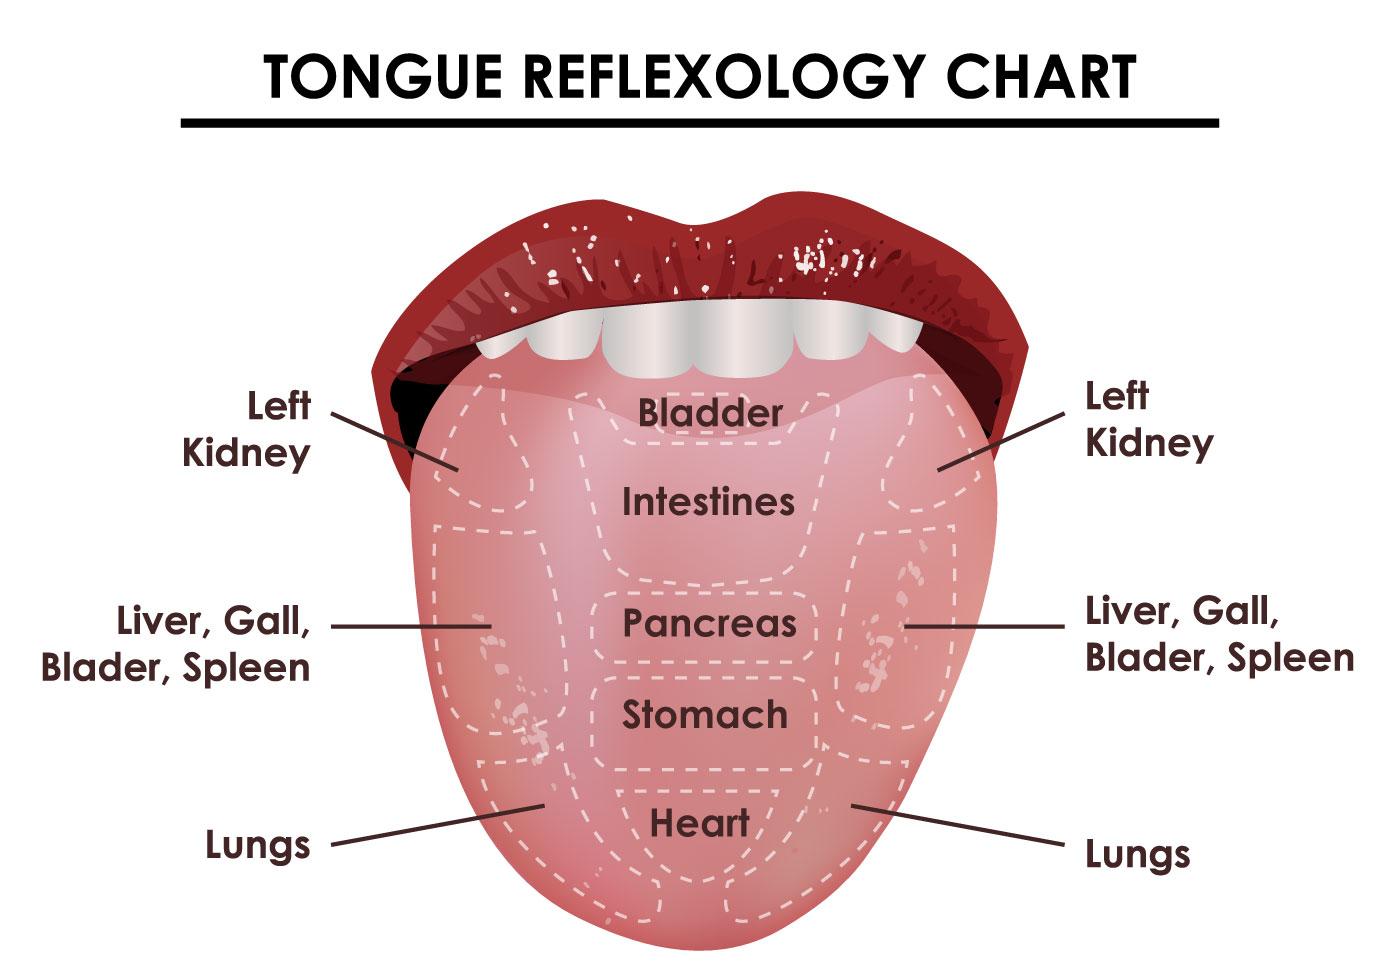 foot massage therapy diagram fujitsu air conditioner wiring tongue reflexology chart download free vector art stock